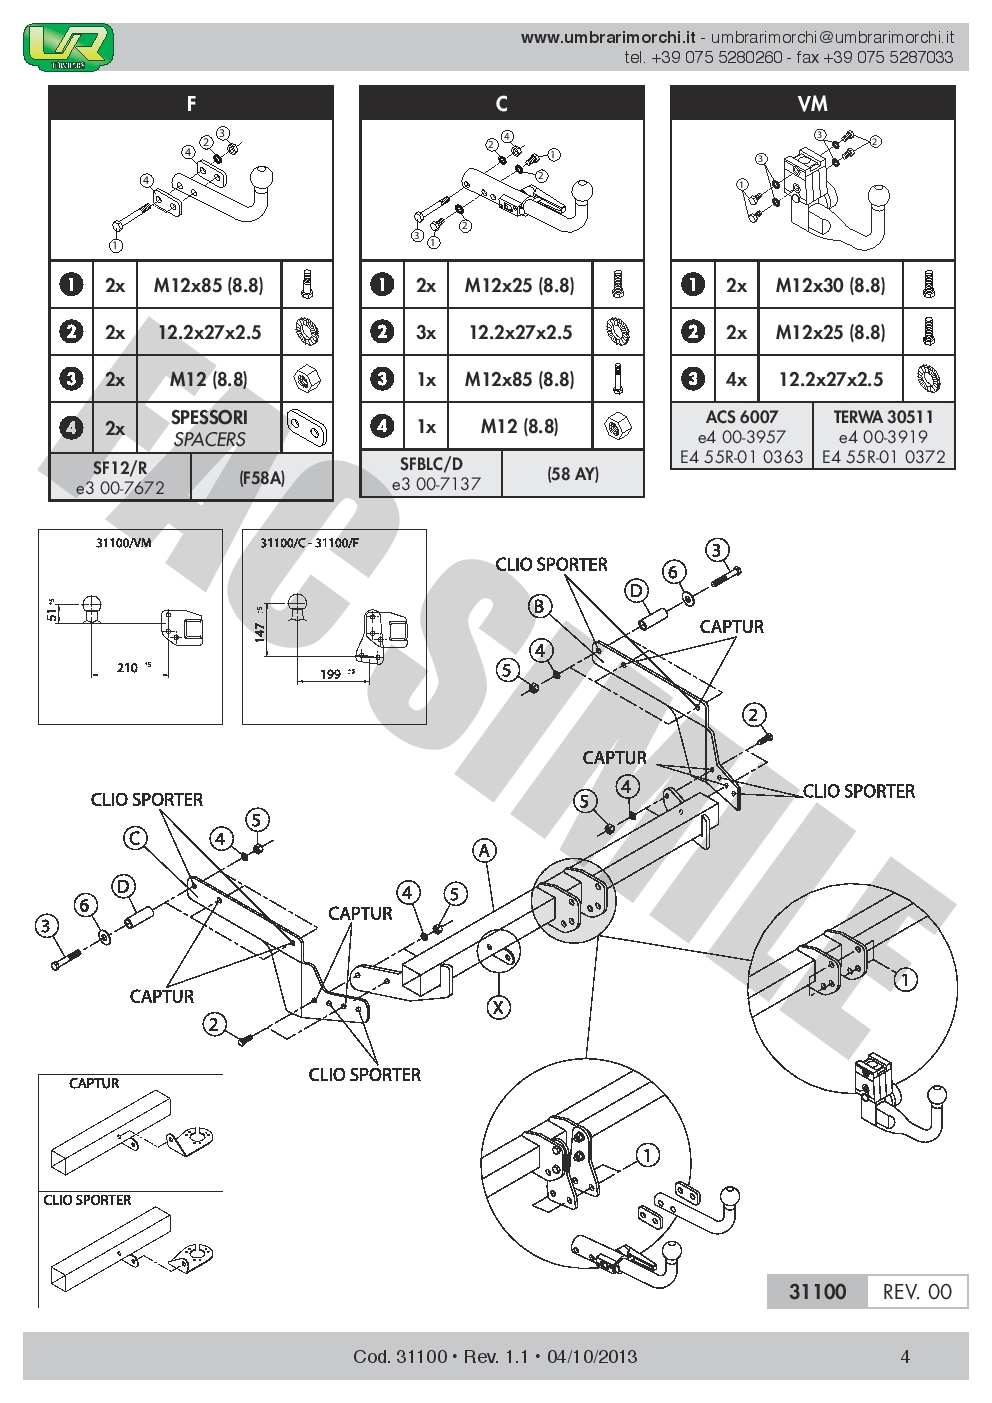 3110/_B1 AHK Vertikale Anhängerkupplung 7p C2 E-Satz Renault Captur Crossover 13